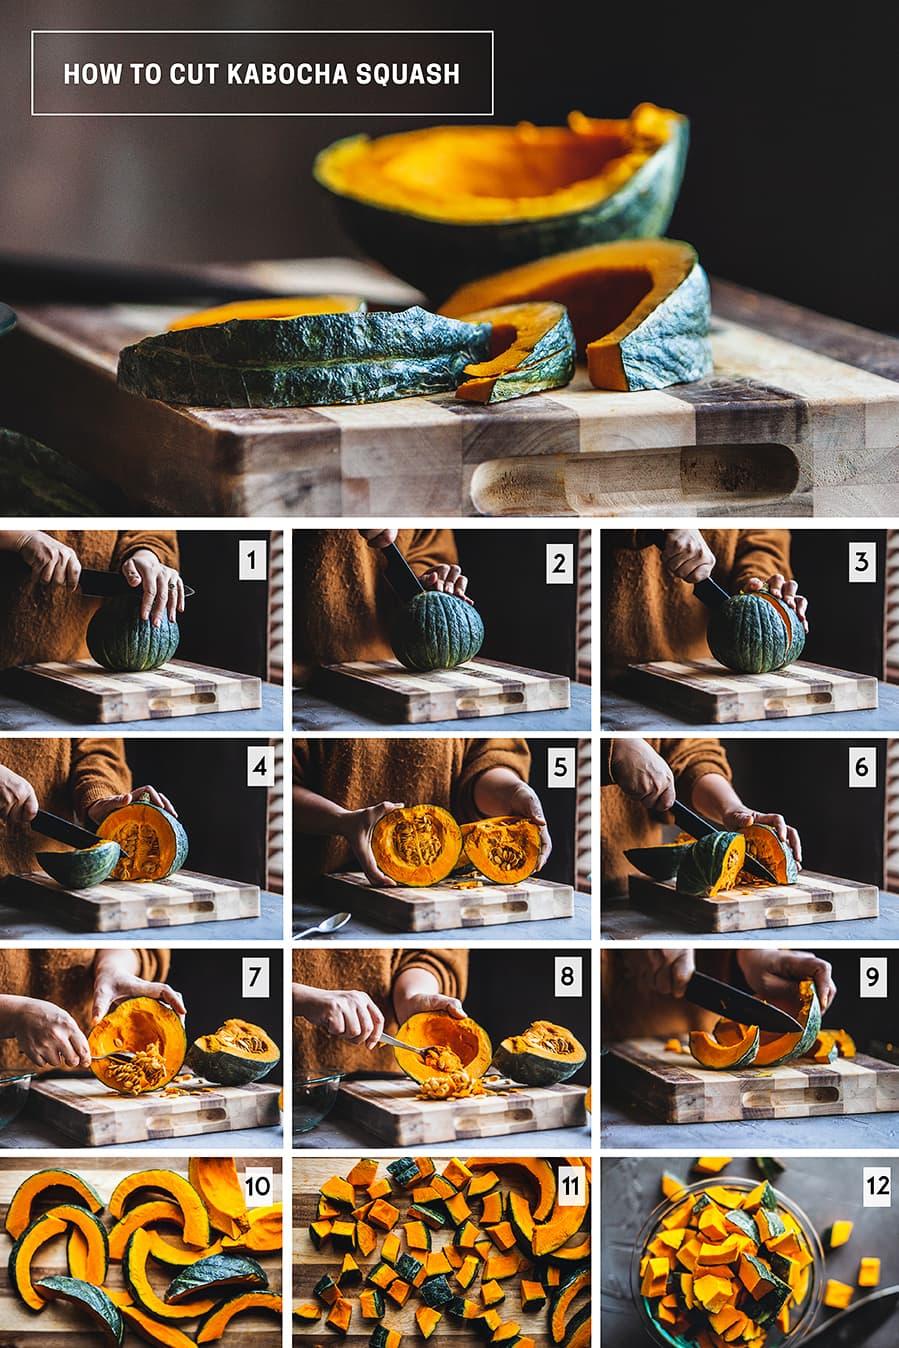 How to cut kabocha squash step by step pictures. What is a kabocha squash and how to cook with Kabocha squash. Easy recipes for kabocha squash.